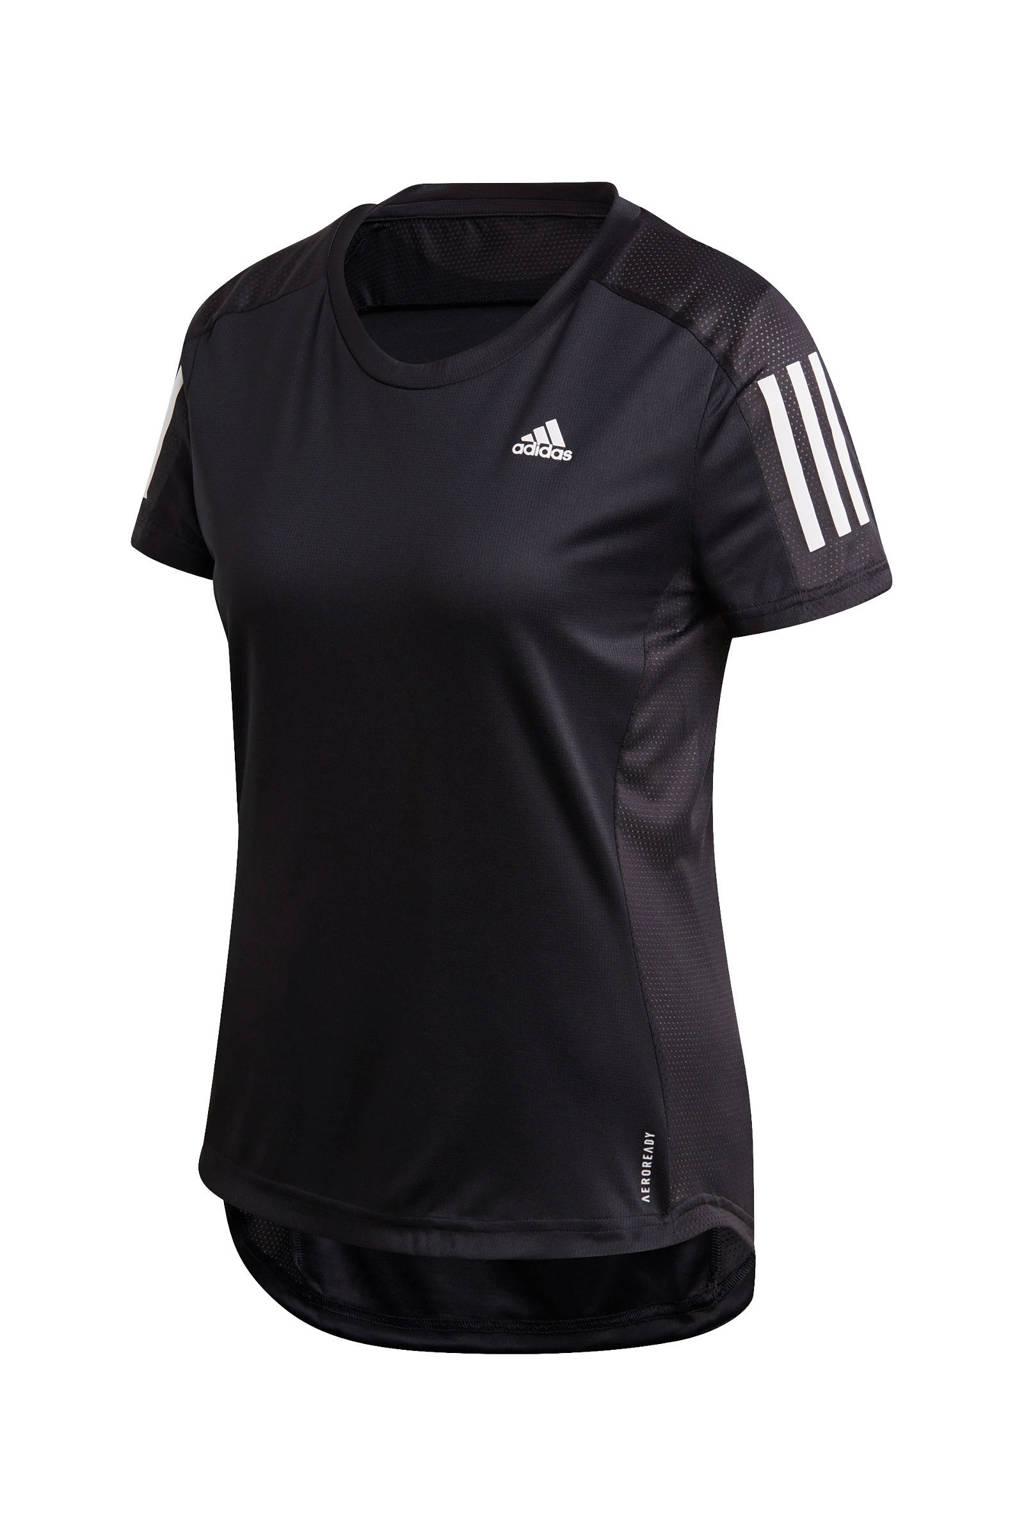 adidas Performance hardloopshirt zwart, Zwart